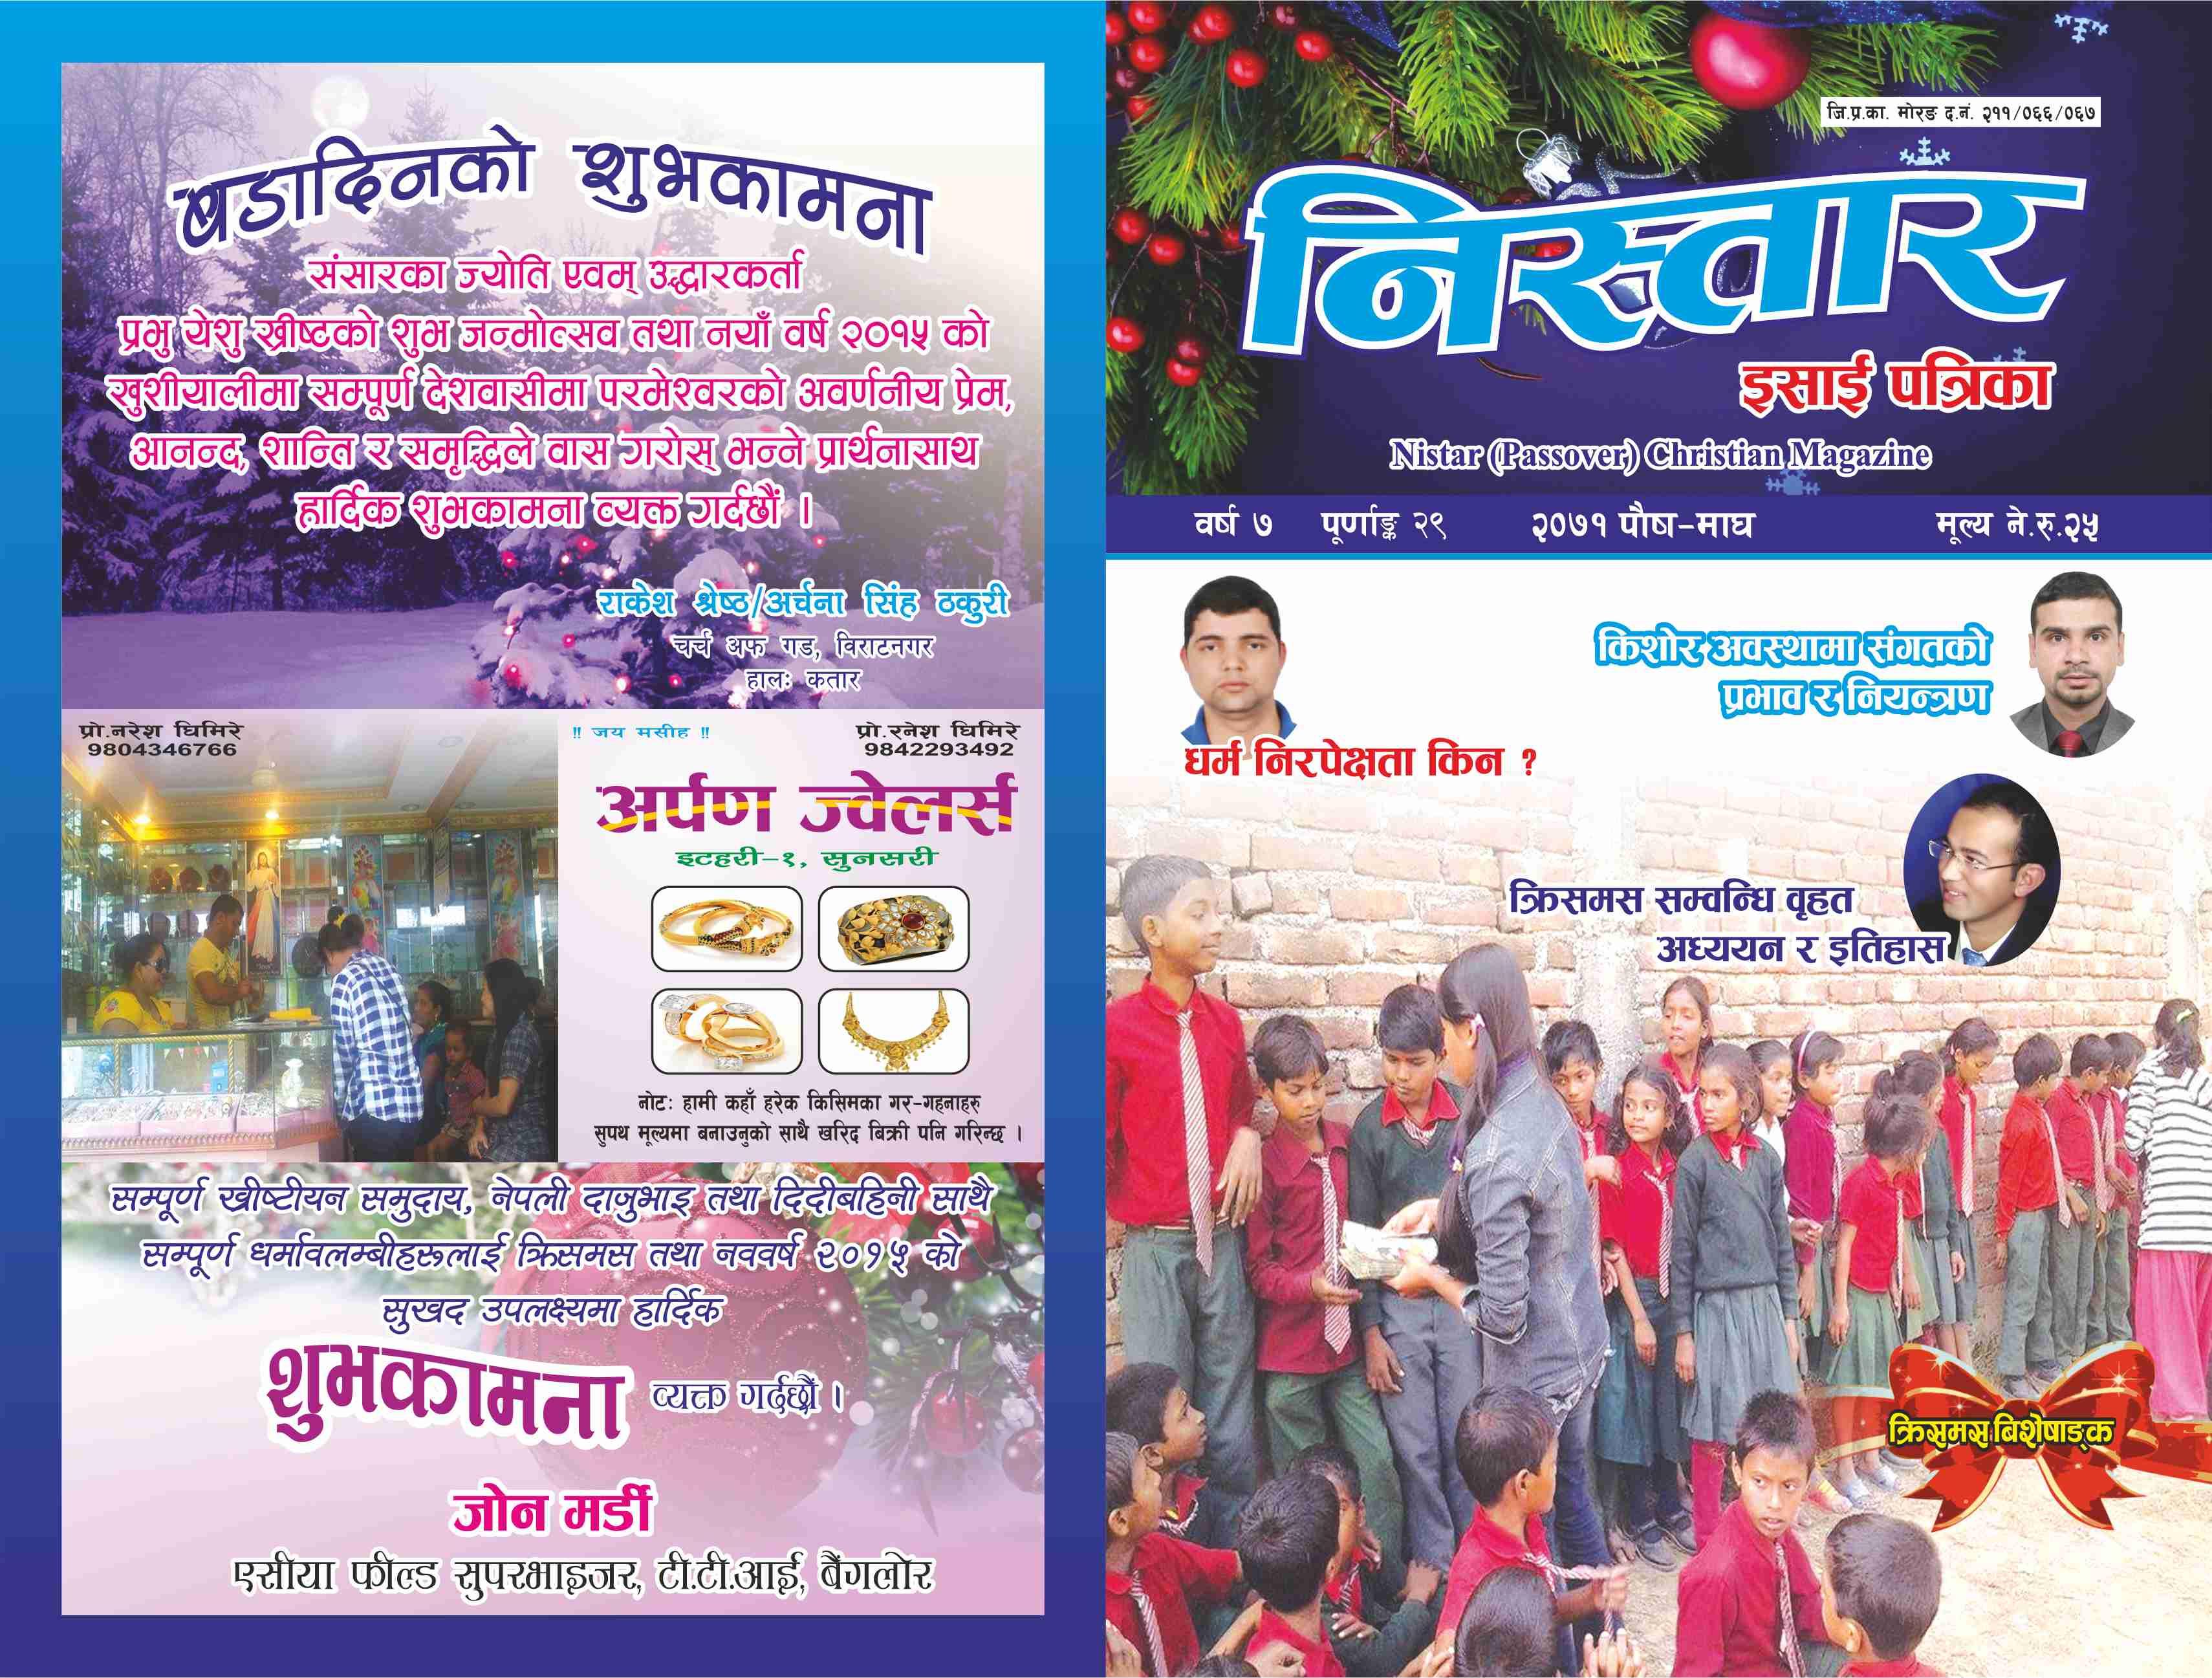 nistar Christmas Cover 2014 1